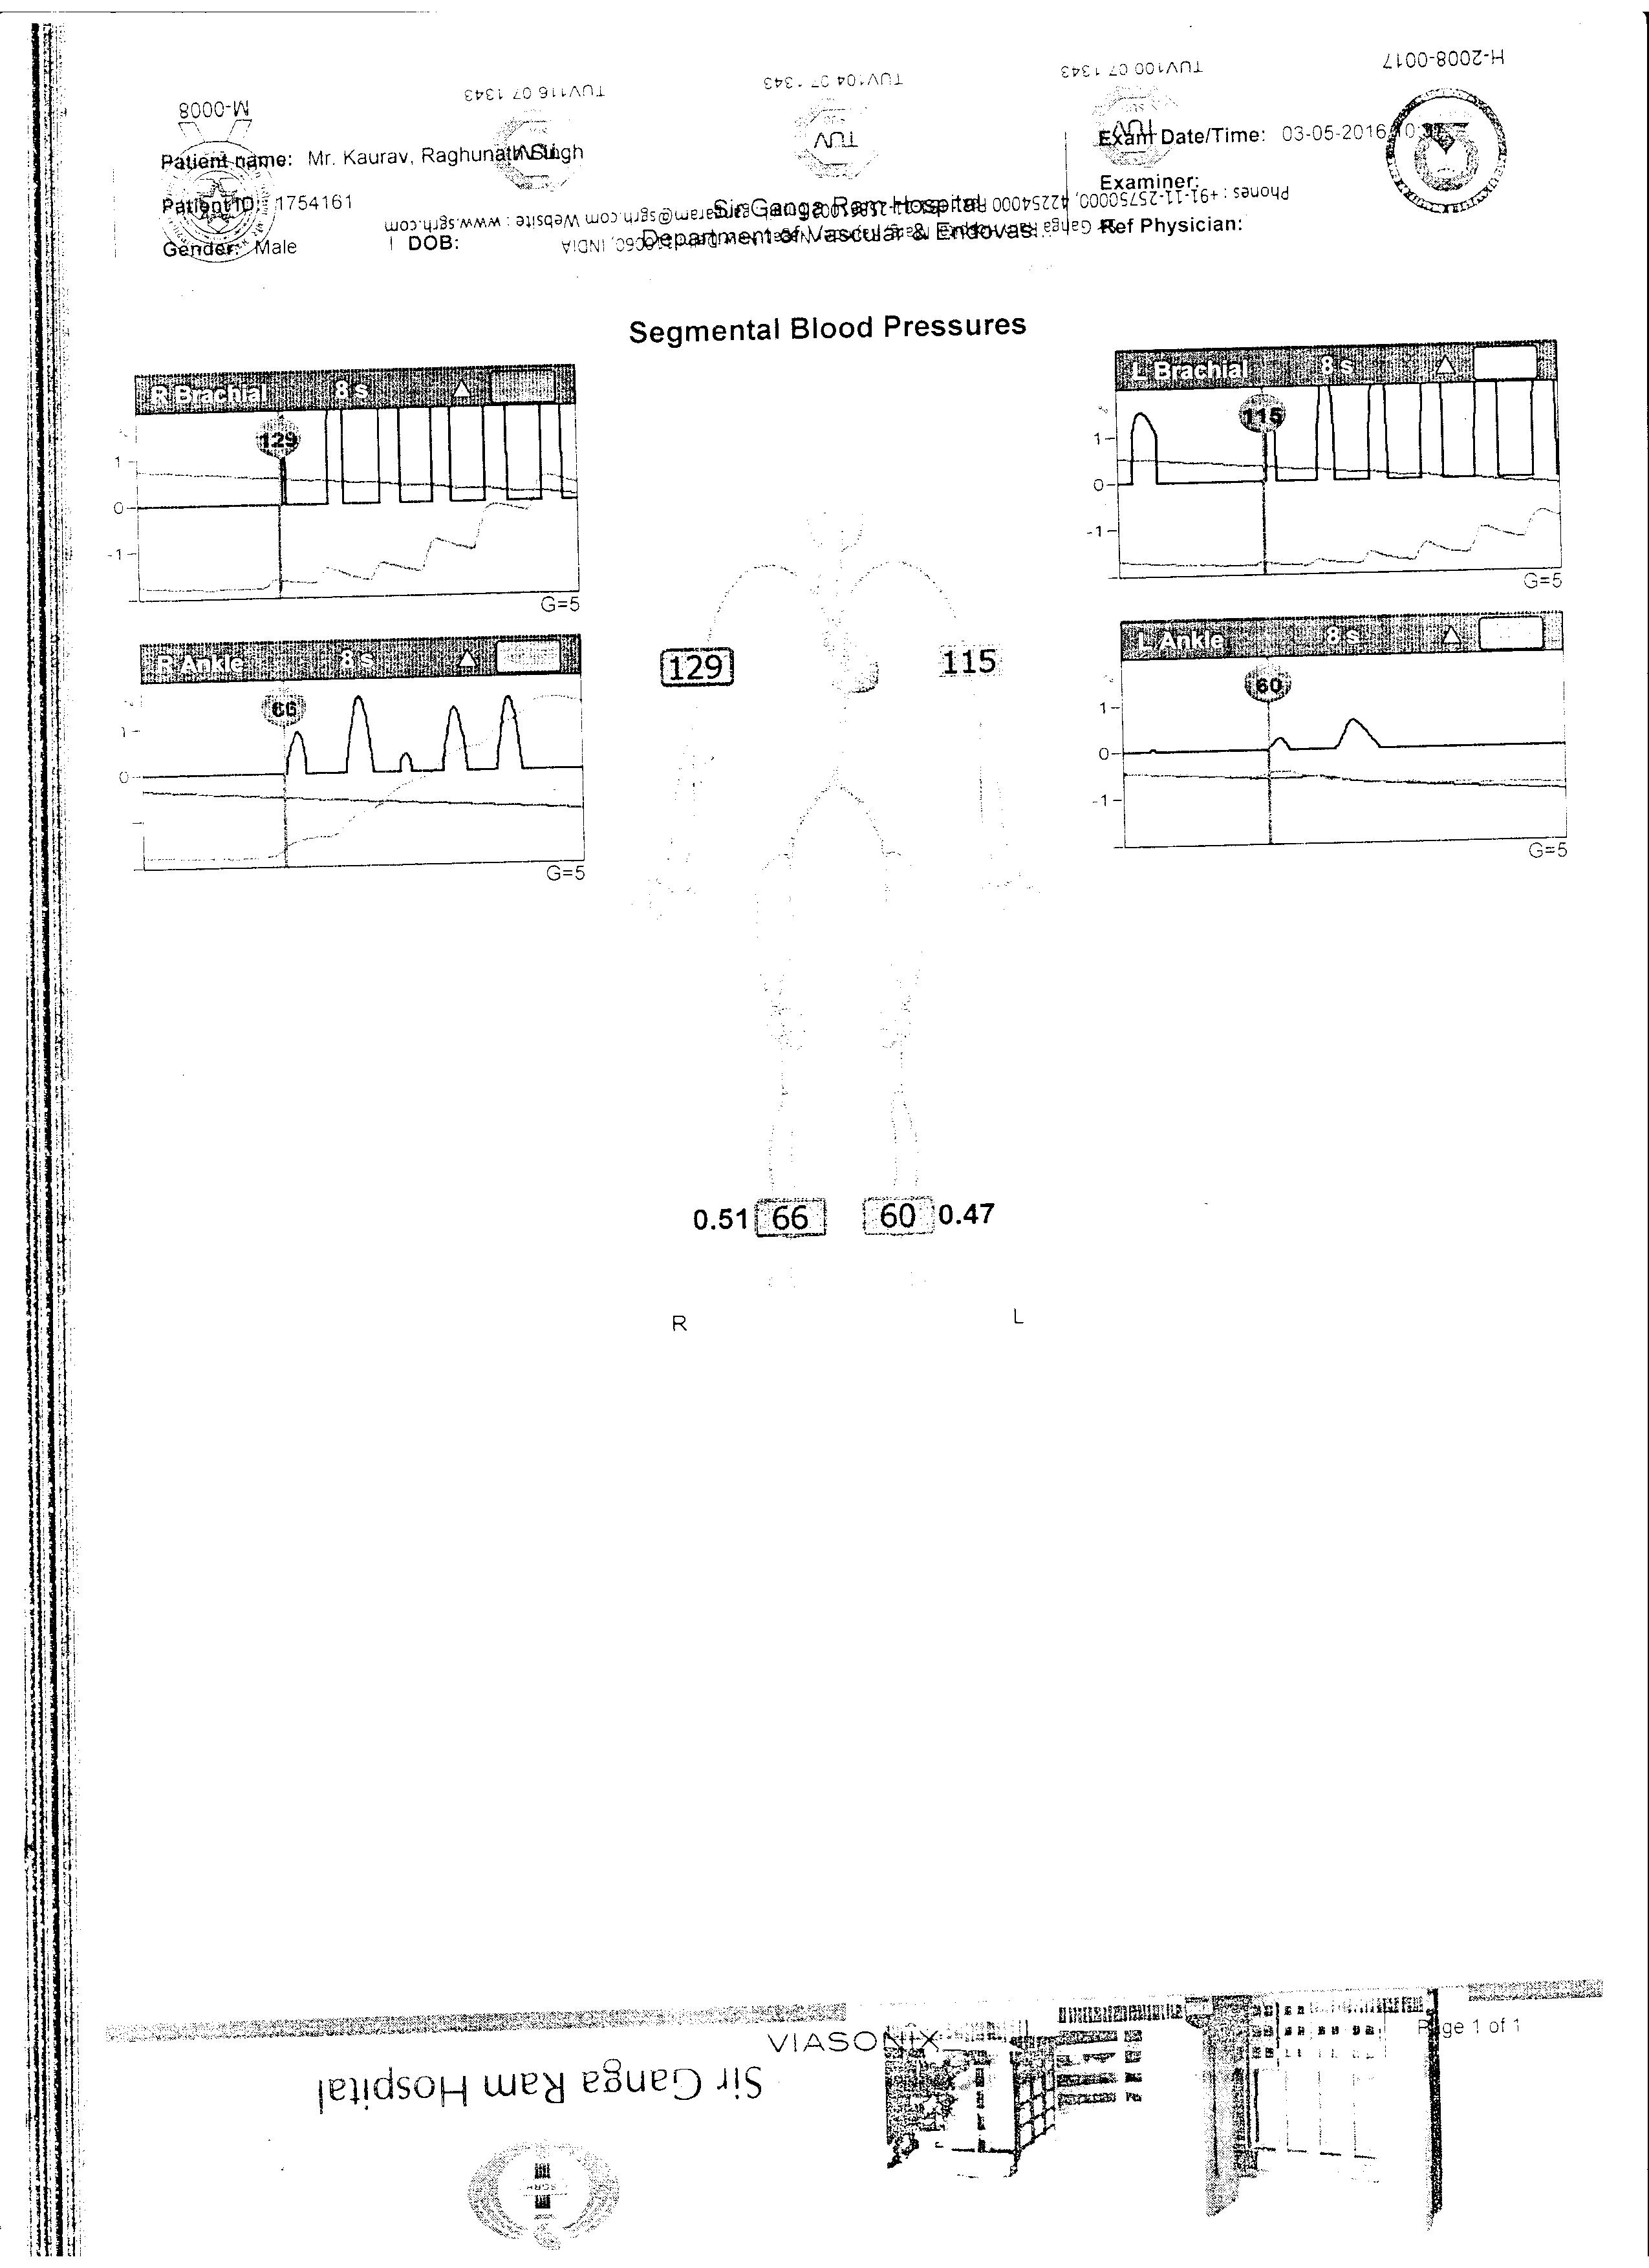 RAGHUNATH-SINGH-KAURAV-57-Yrs-DVT-treatment-1